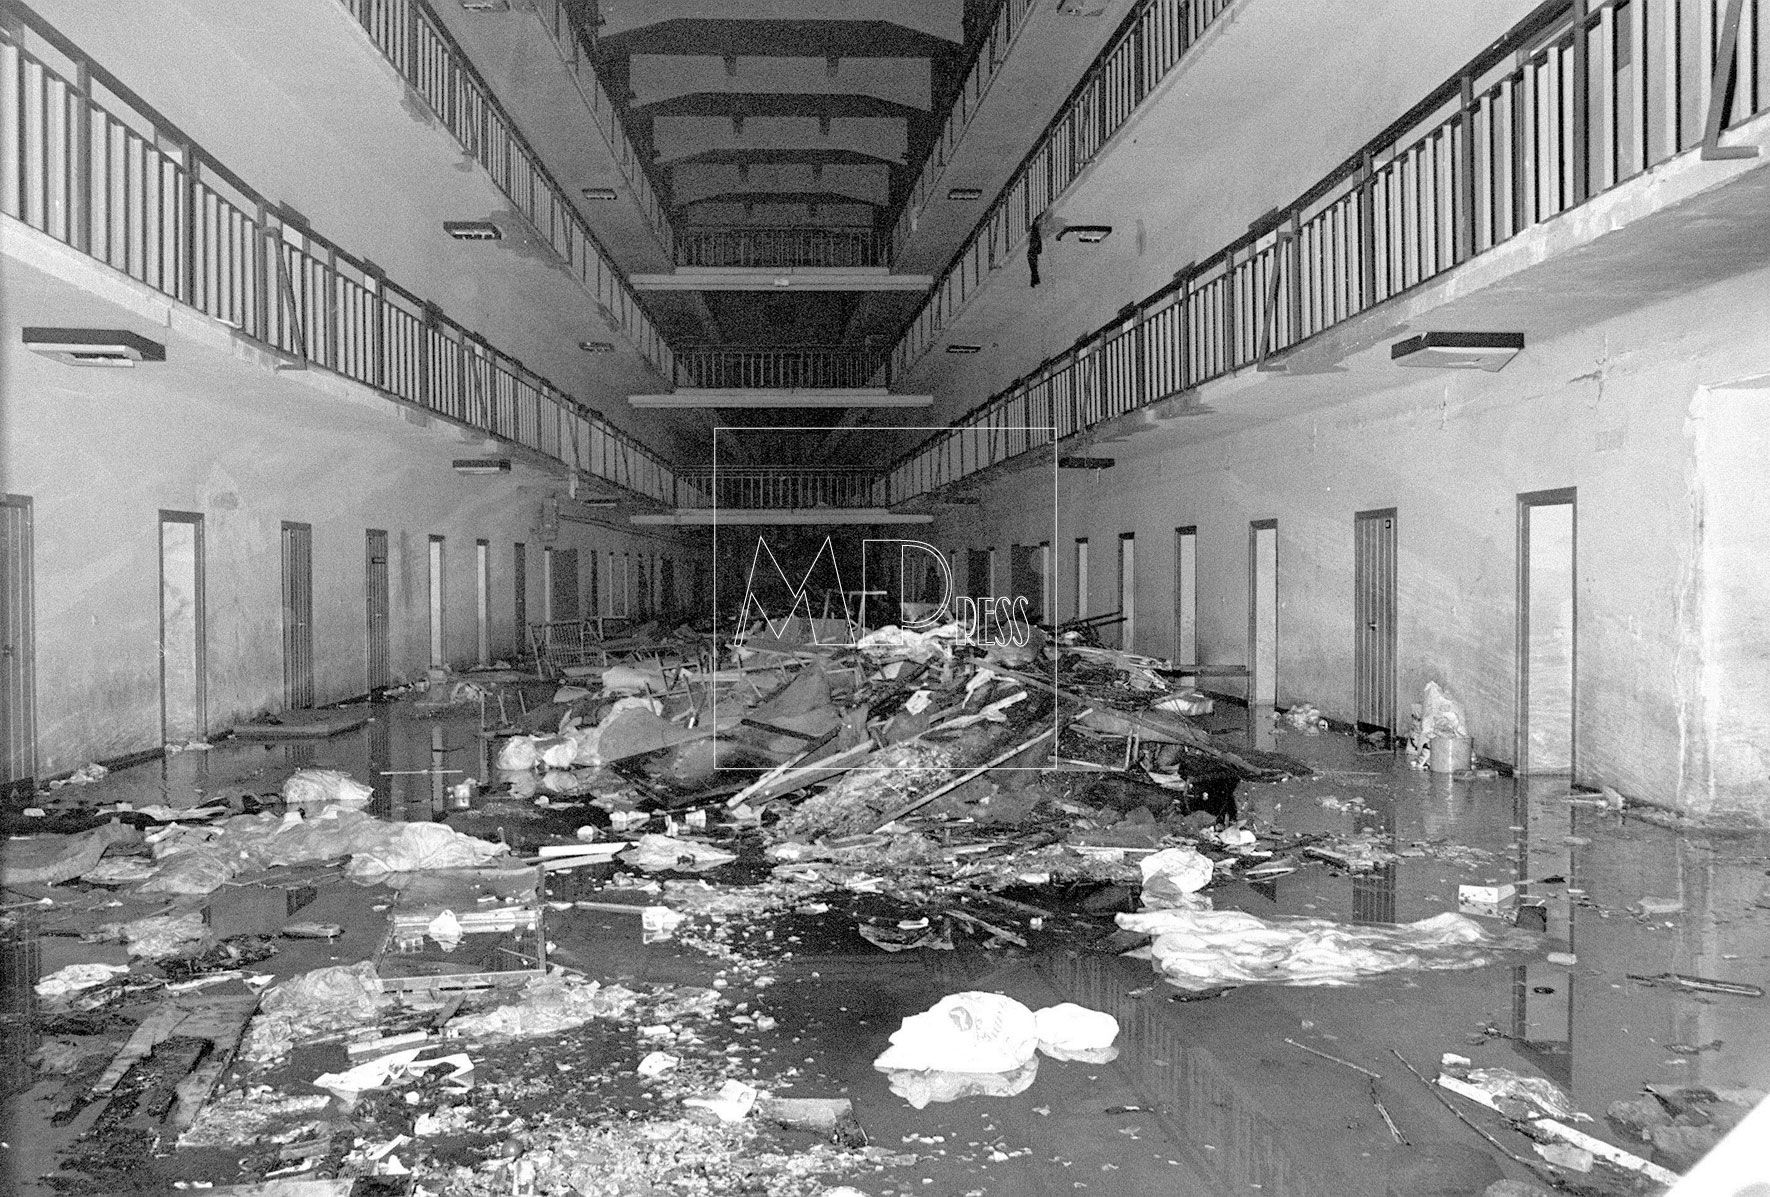 Motín cárcel de Carabanchel